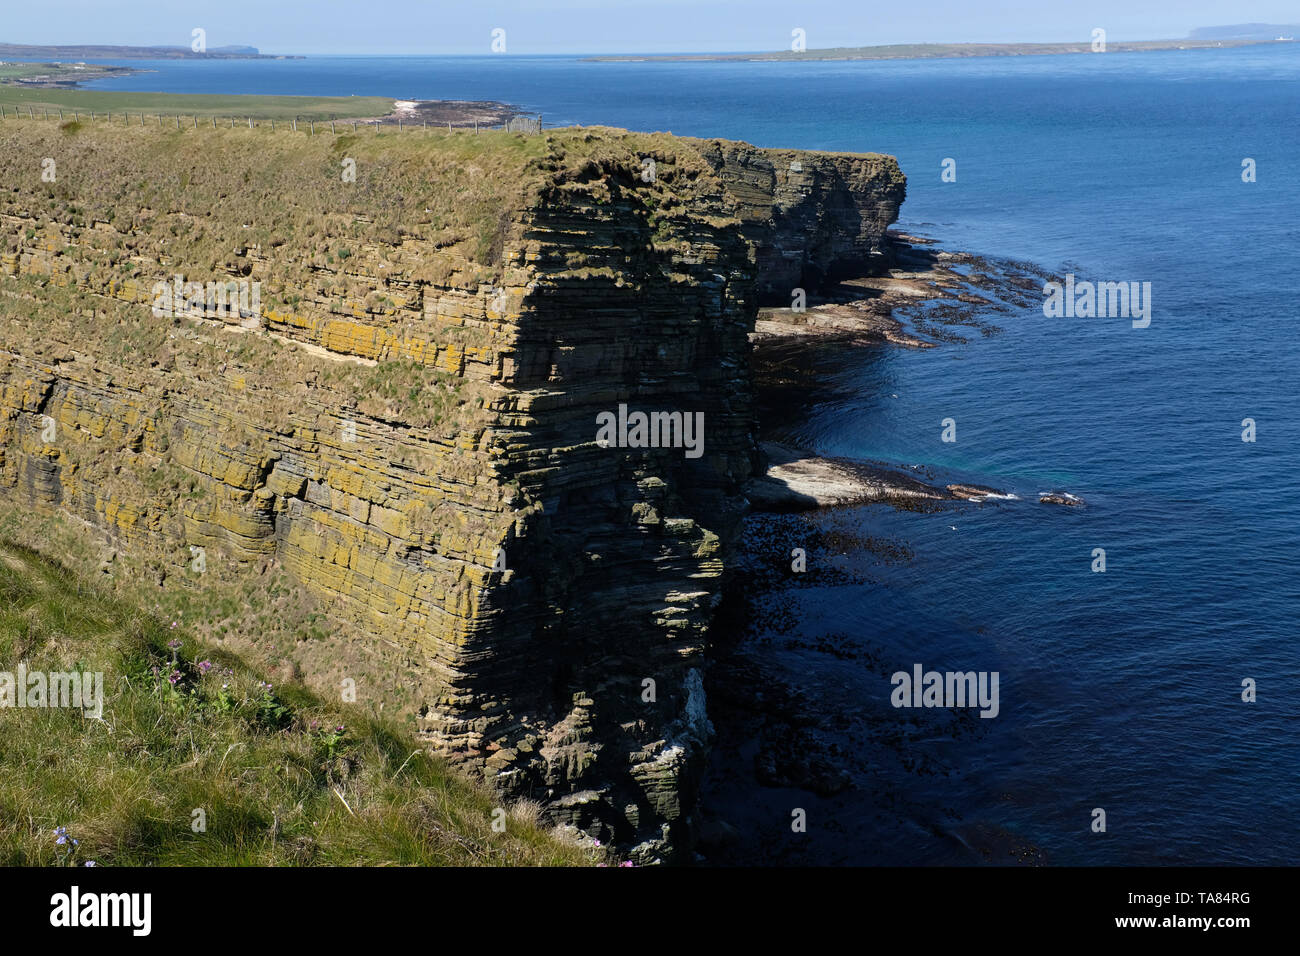 North coast, cliffs close to John o' Groat Scotland May 8th - 19th. Trip across Scotland Foto Samantha Zucchi Insidefoto - Stock Image